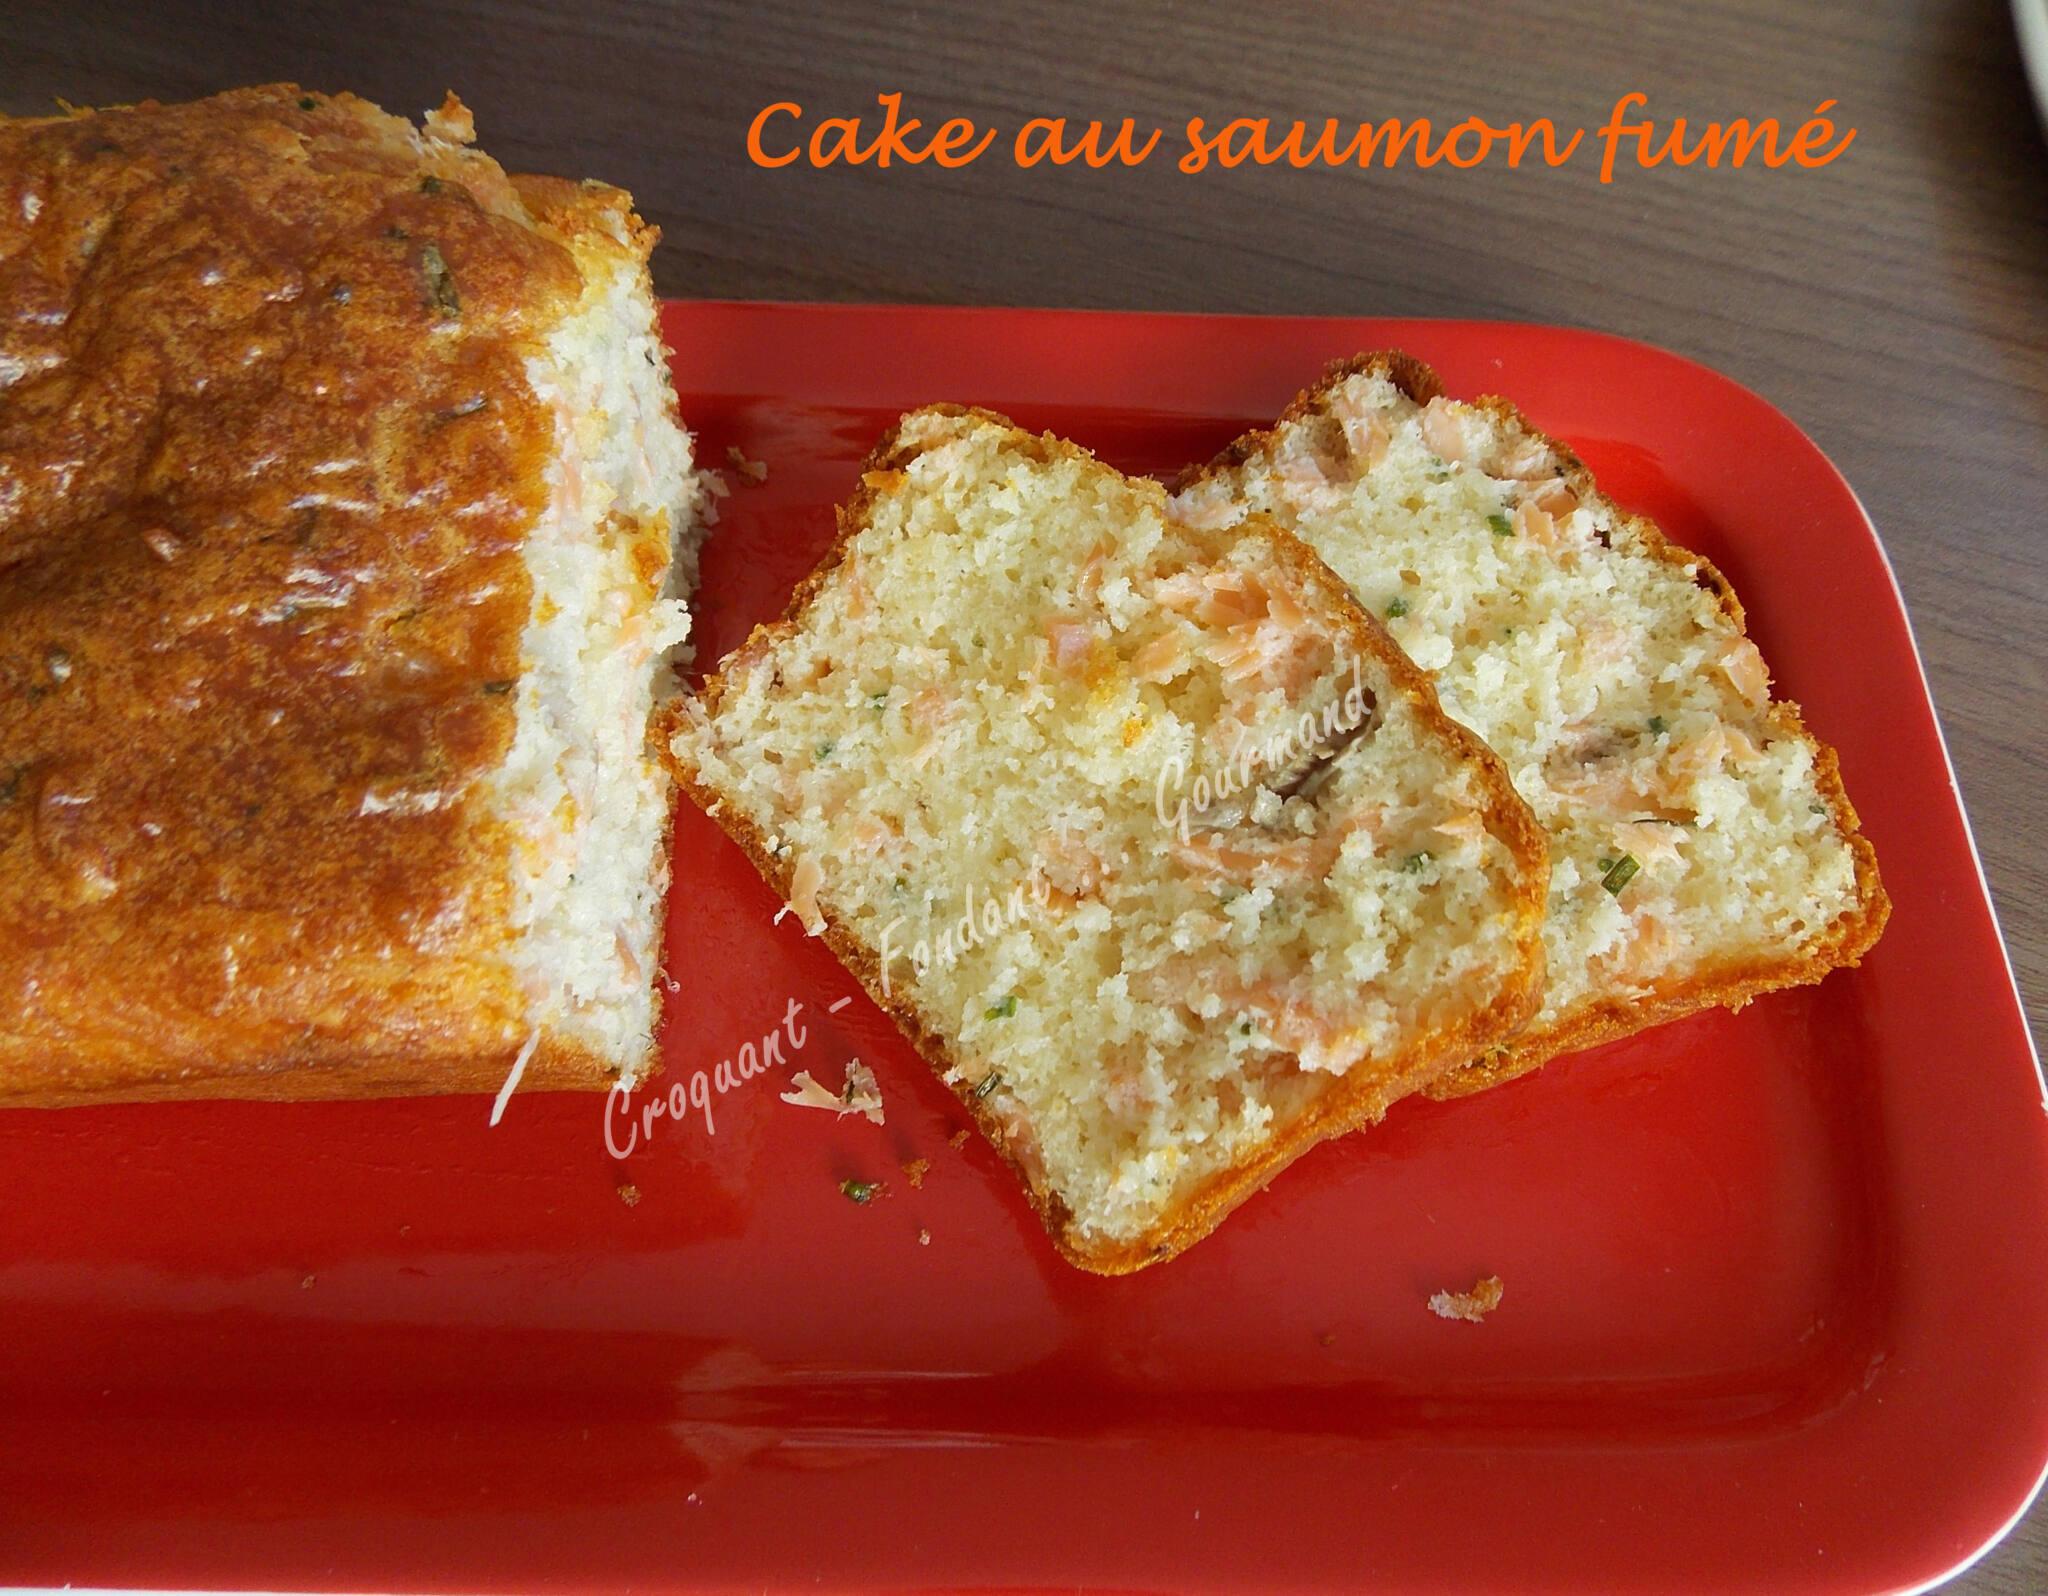 cake au saumon fum croquant fondant gourmand. Black Bedroom Furniture Sets. Home Design Ideas